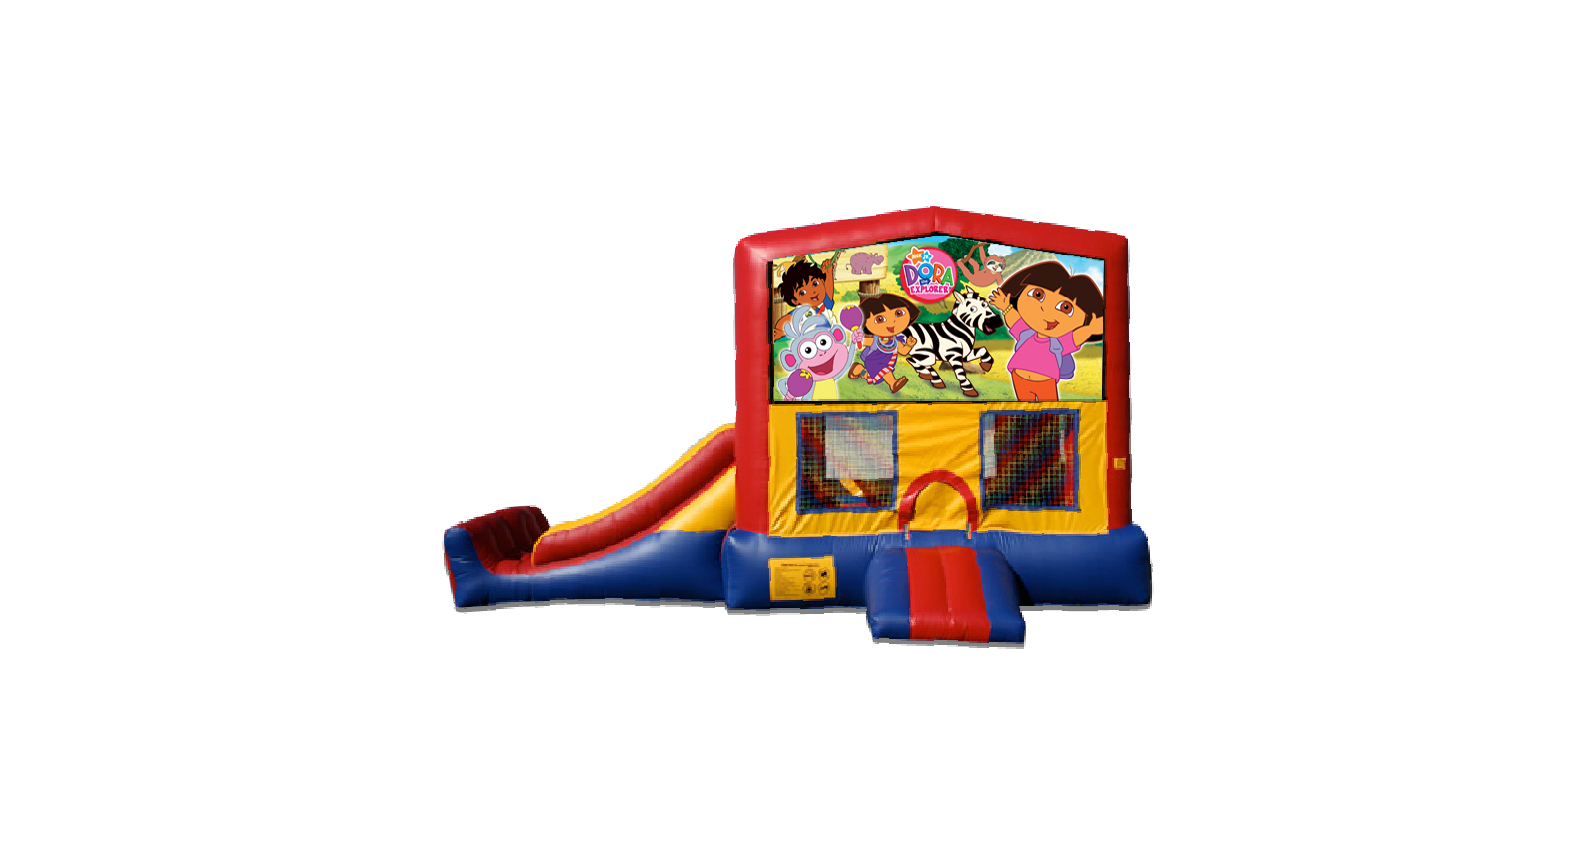 Dora the Explorer 3 in 1 Mini Slide